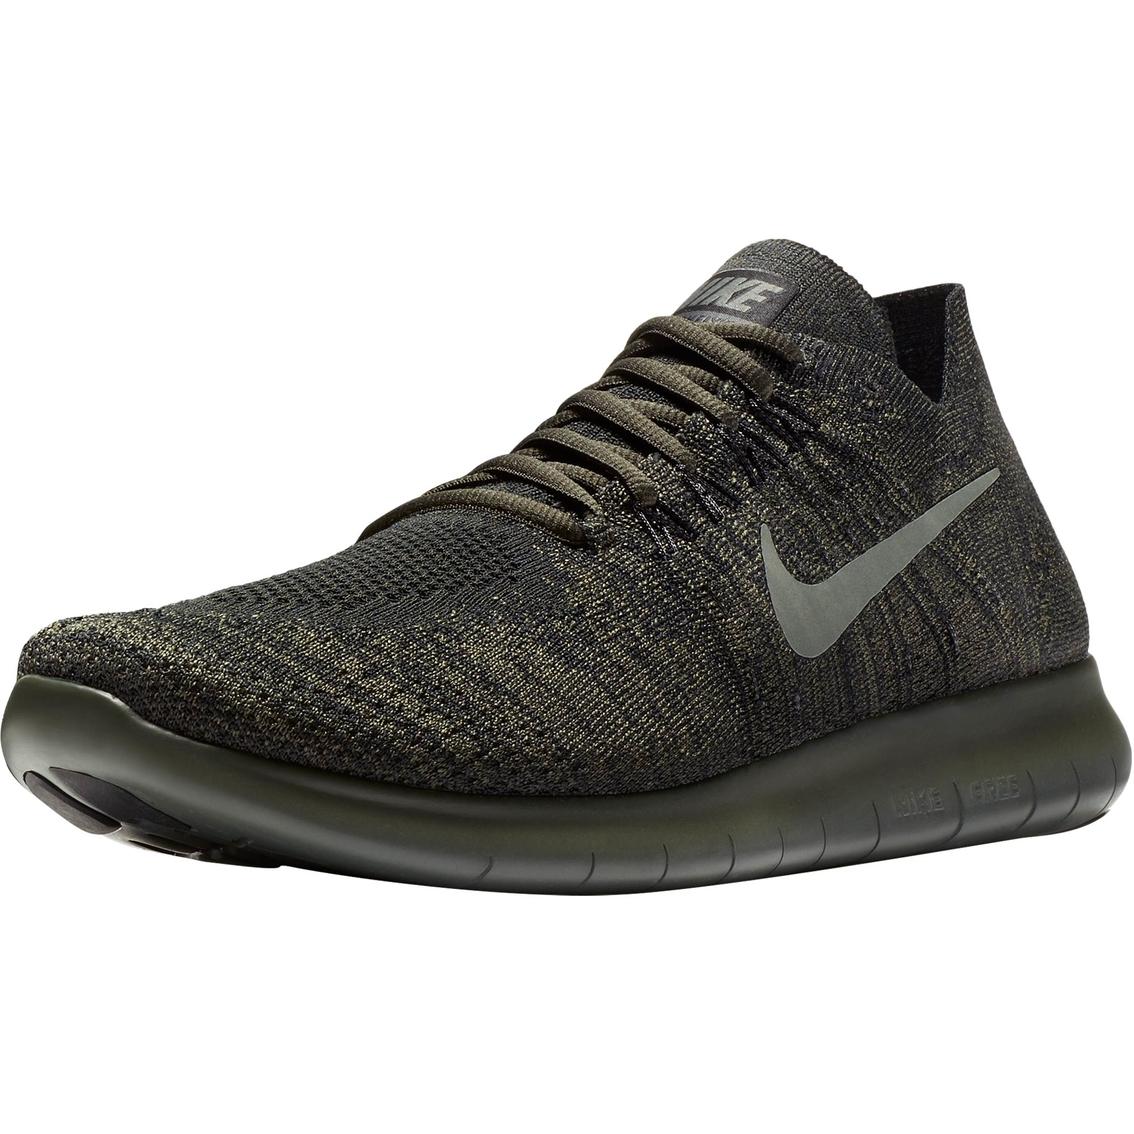 1e145f365ffb4 Nike Men s Free Rn Flyknit 2017 Running Shoes